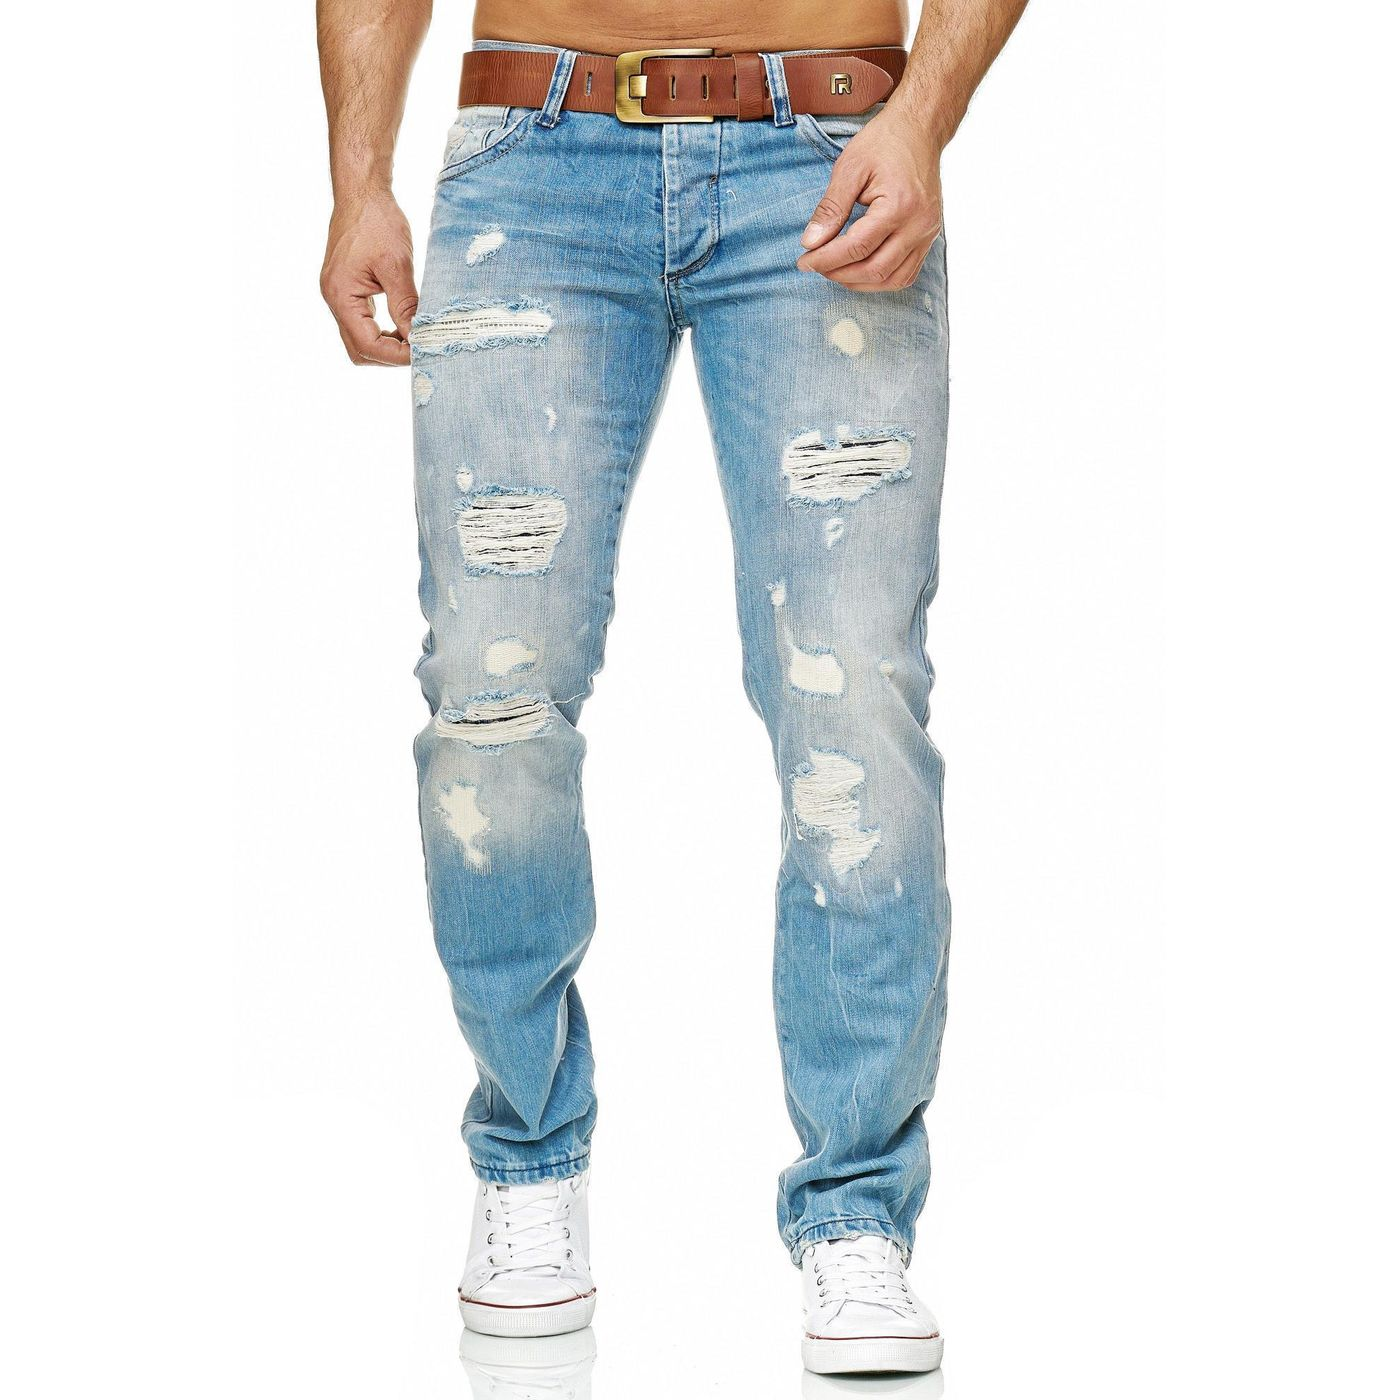 BEHYPE Jeans Herren Röhrenjeans Destroyed Chino Hose Blau//Schwarz//Grau NEU